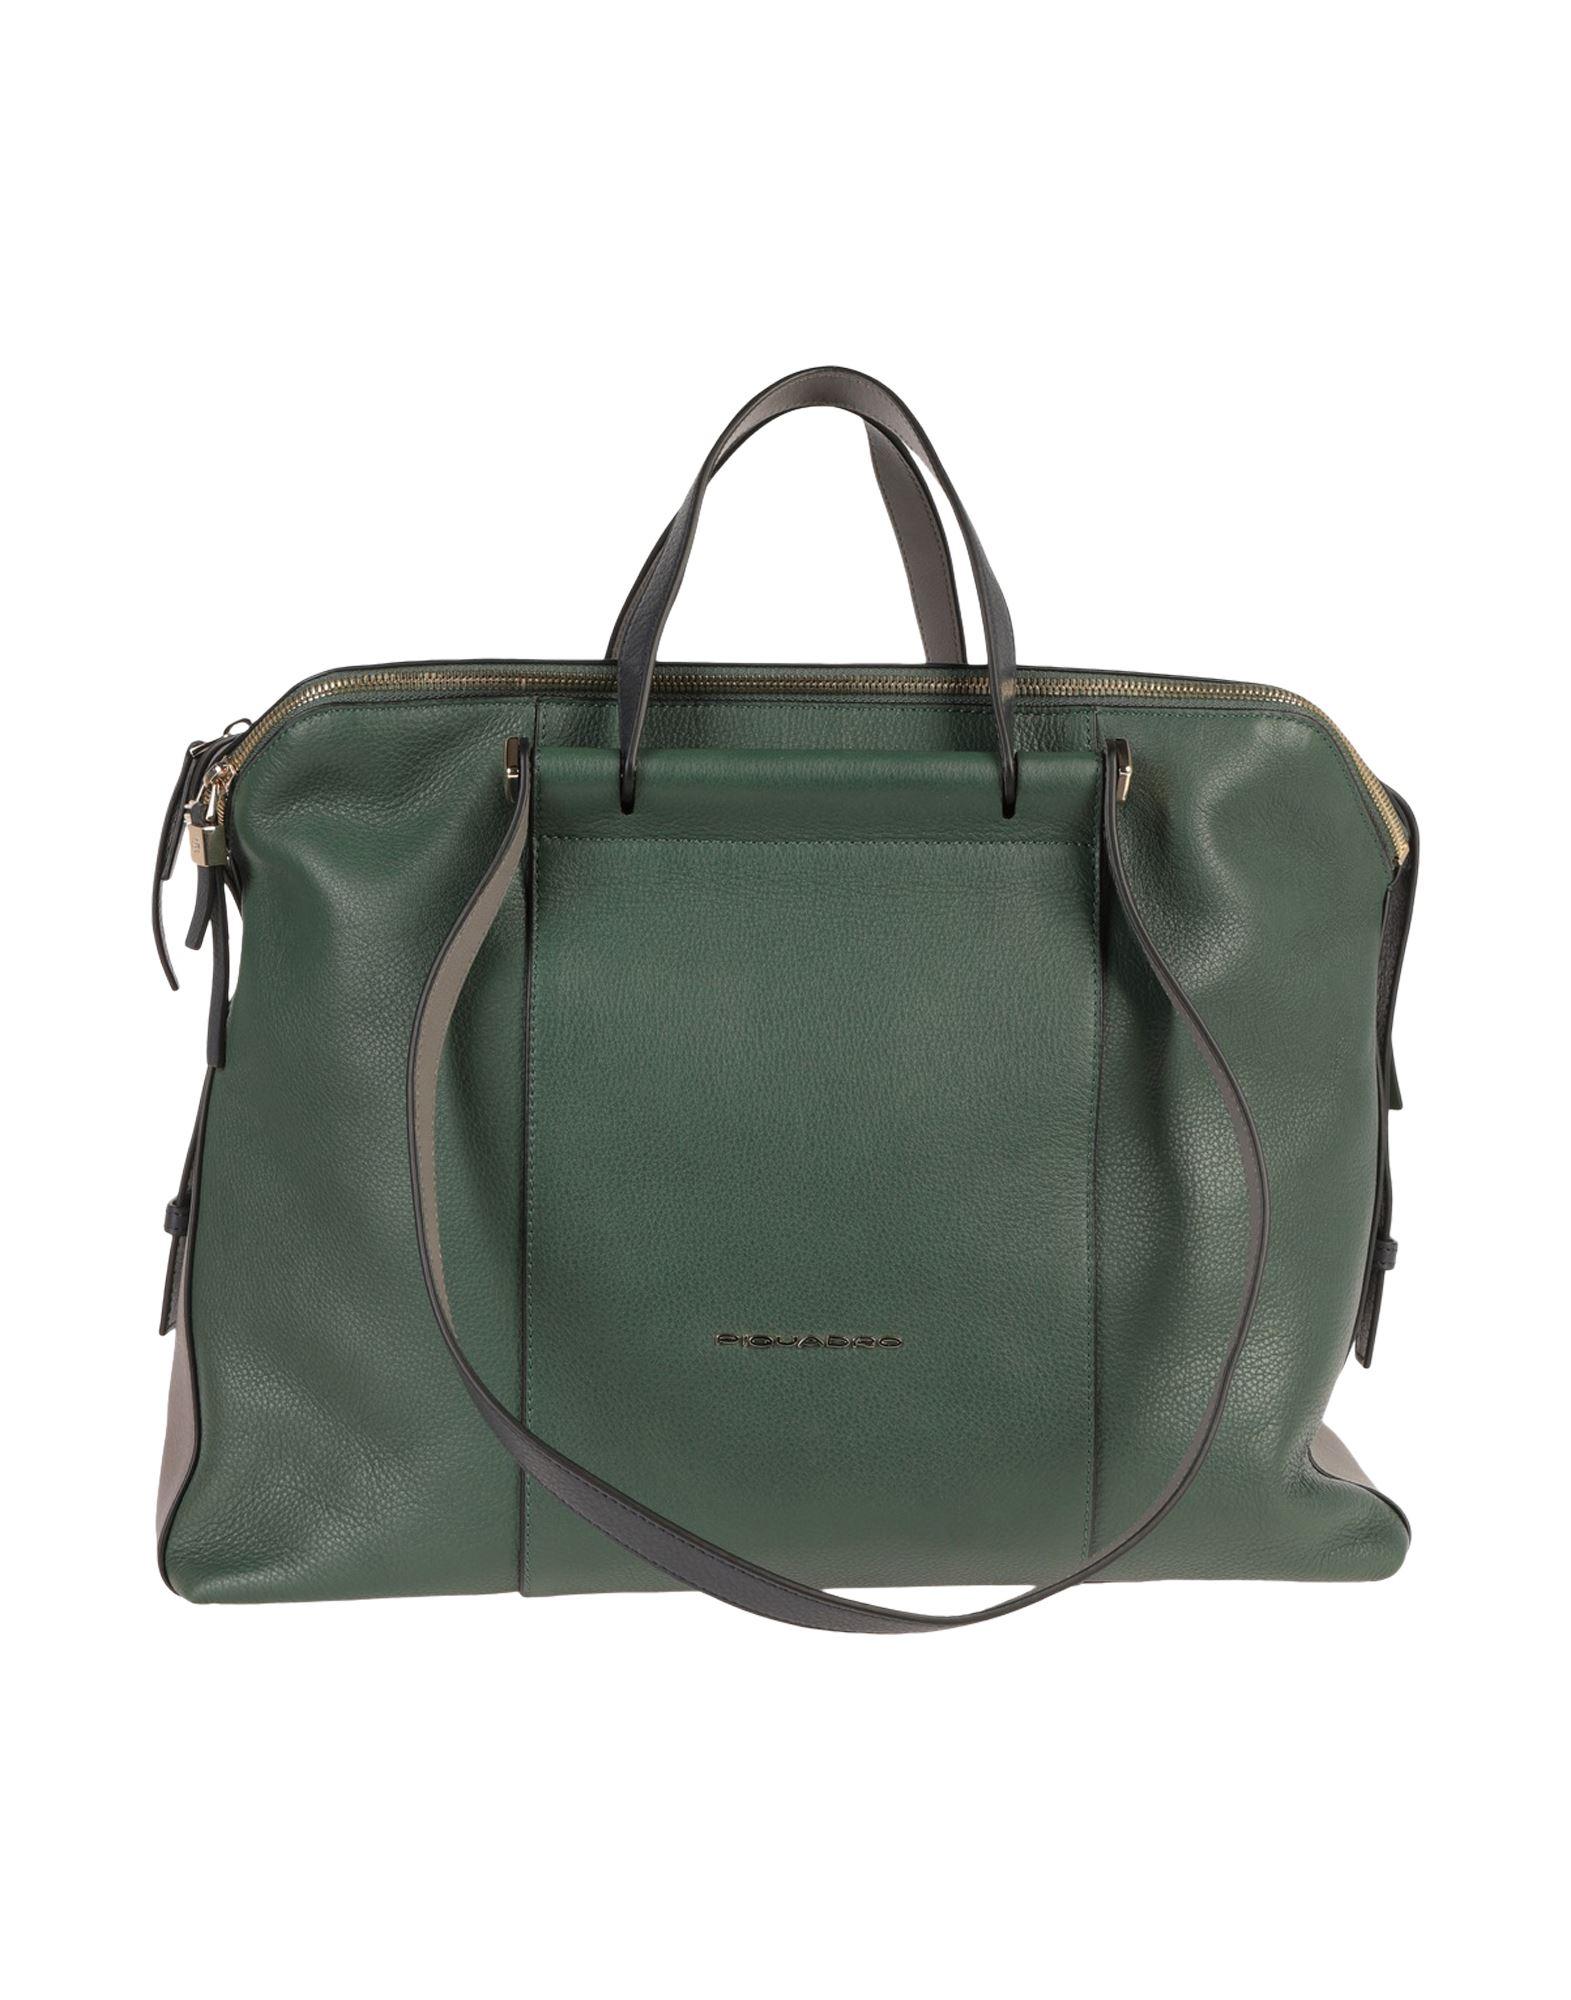 PIQUADRO Деловые сумки bag giulia monti сумки деловые